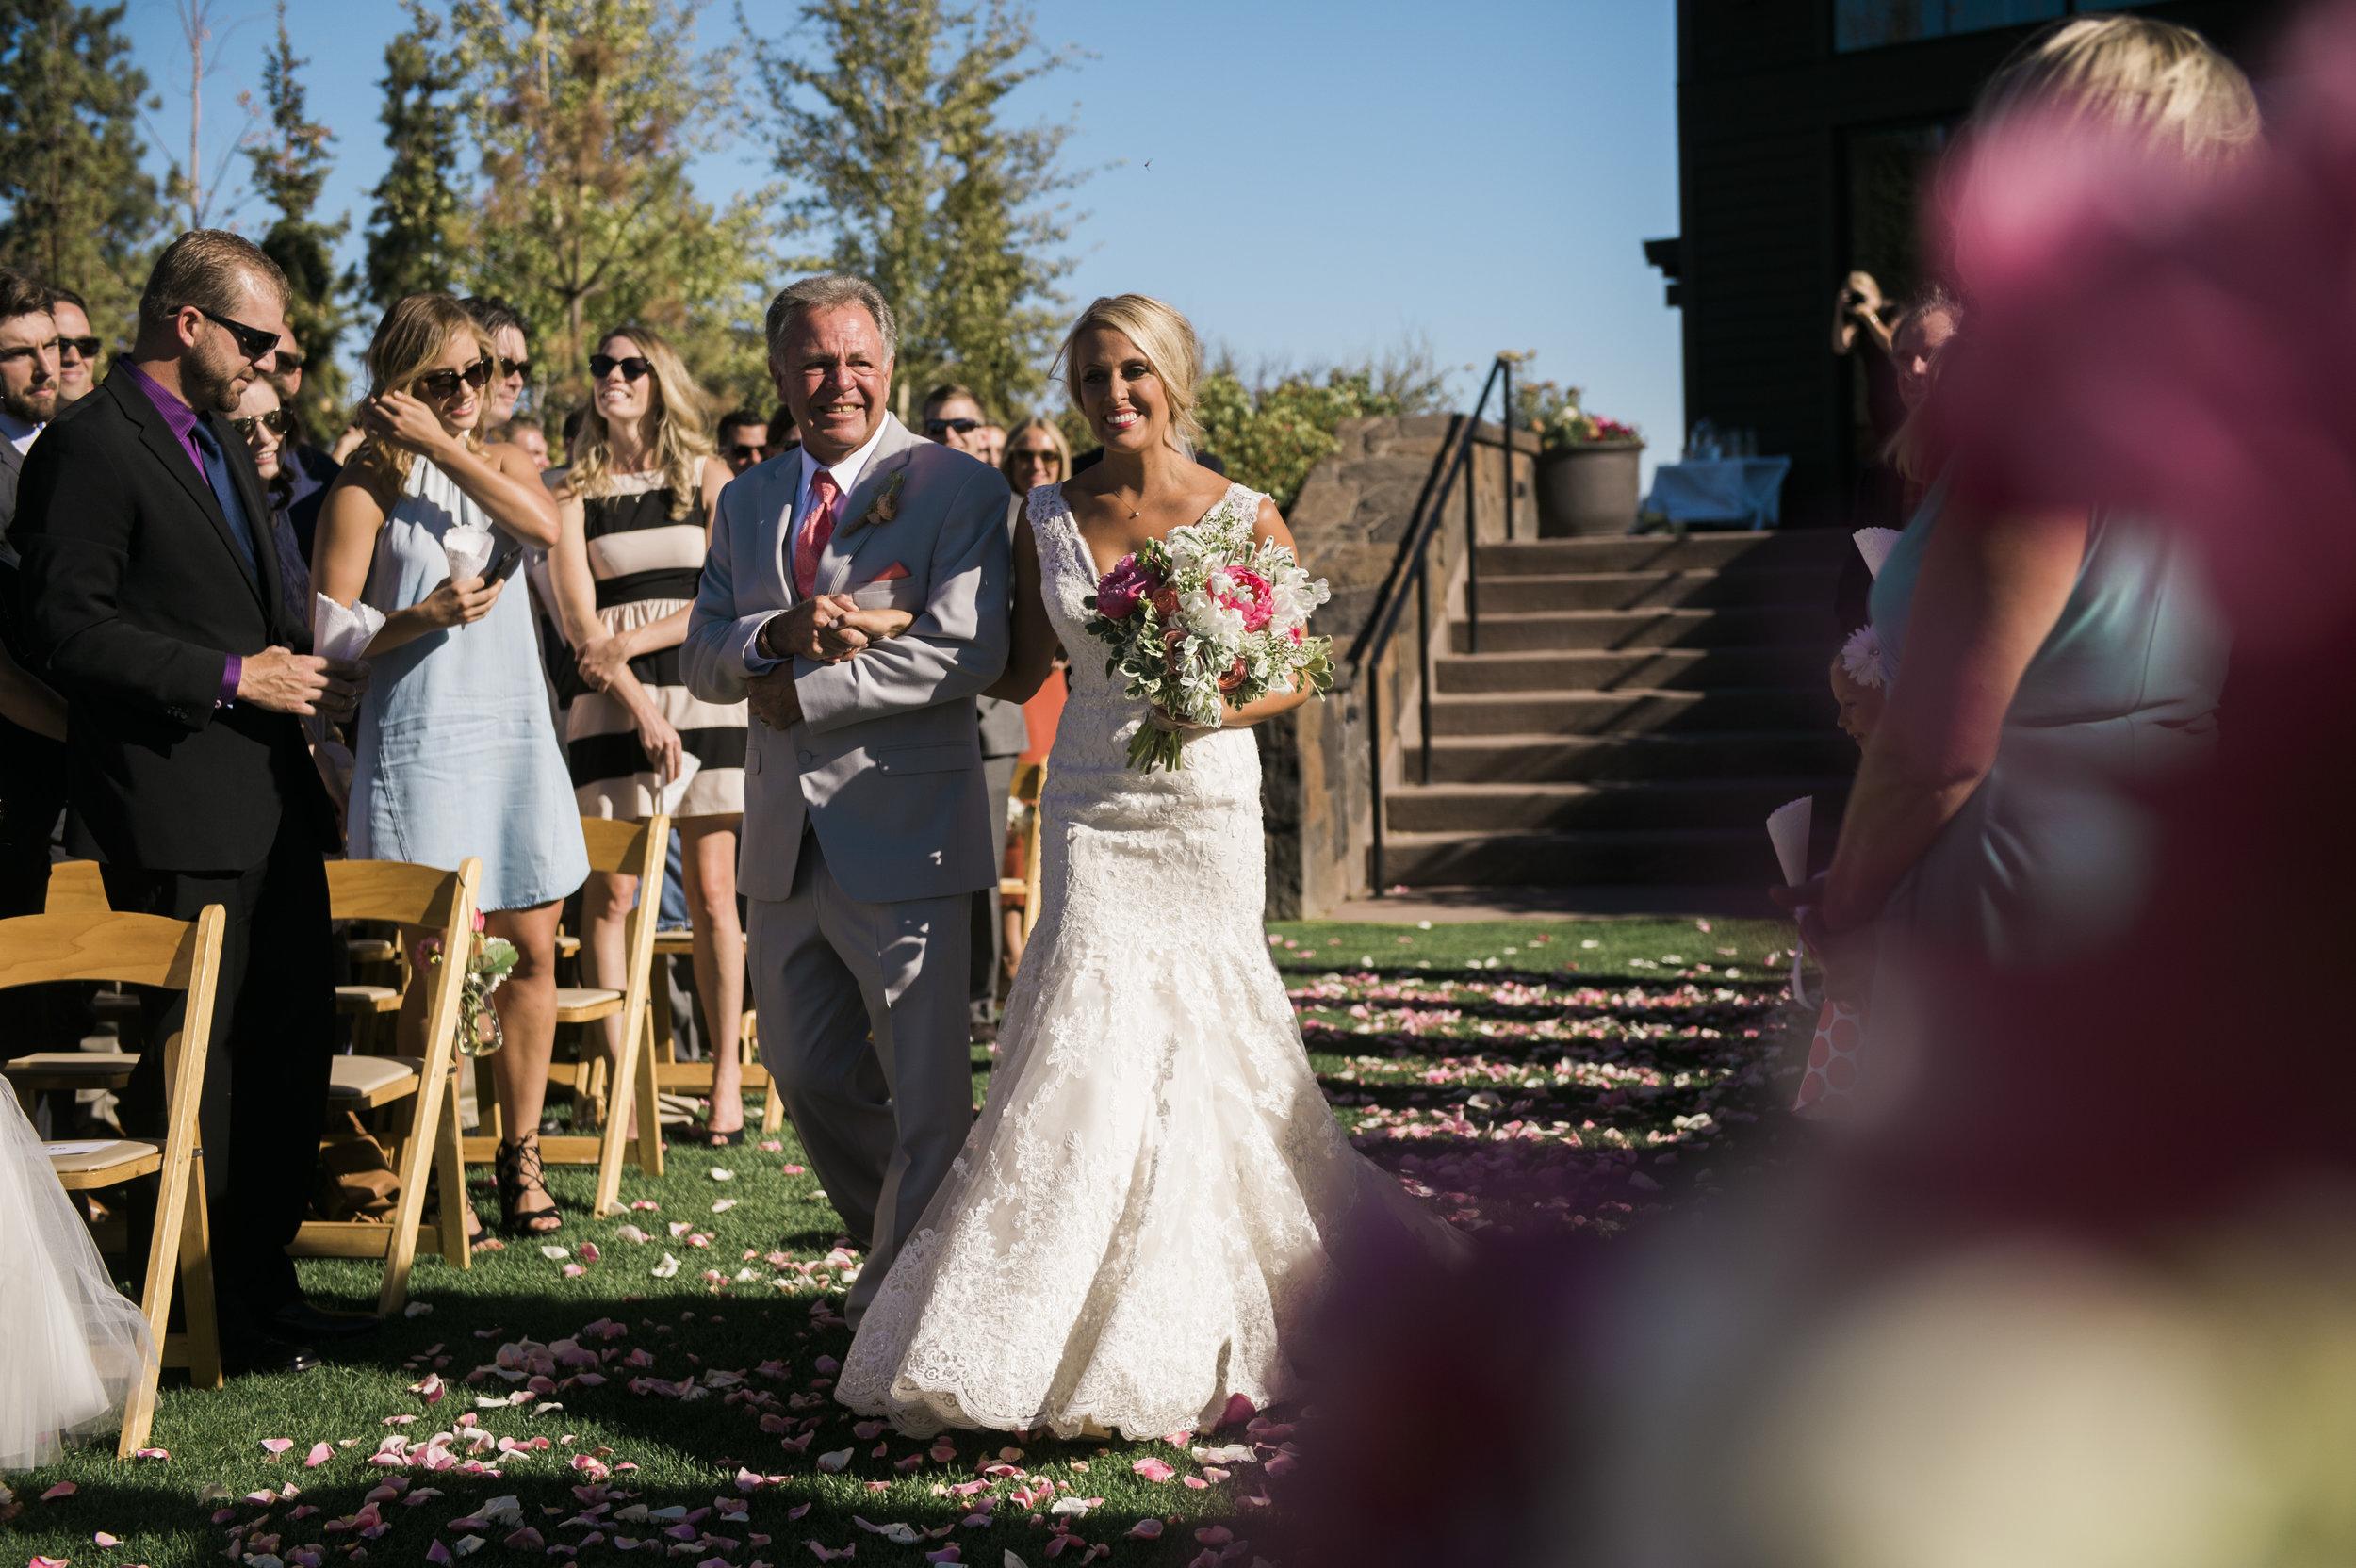 Bridalbliss.com | Portland Wedding | Oregon Event Planning and Design | Kimberly Kay Photography